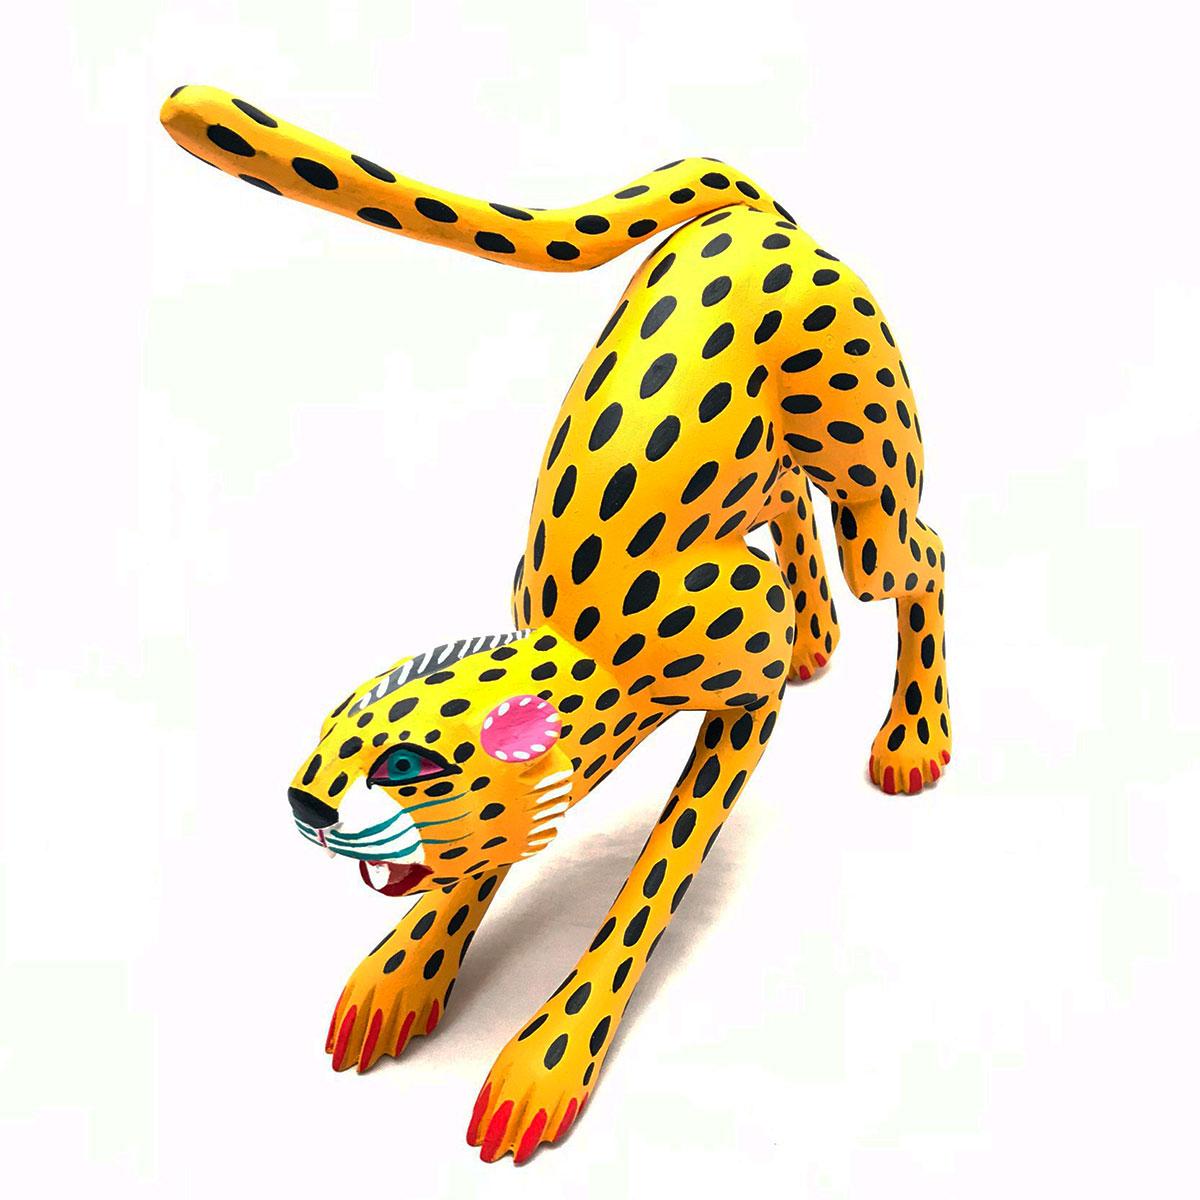 Moises Jimenez & Oralia Cardenas Moises Jimenez & Oralia Cardenas: Cheetah Cats